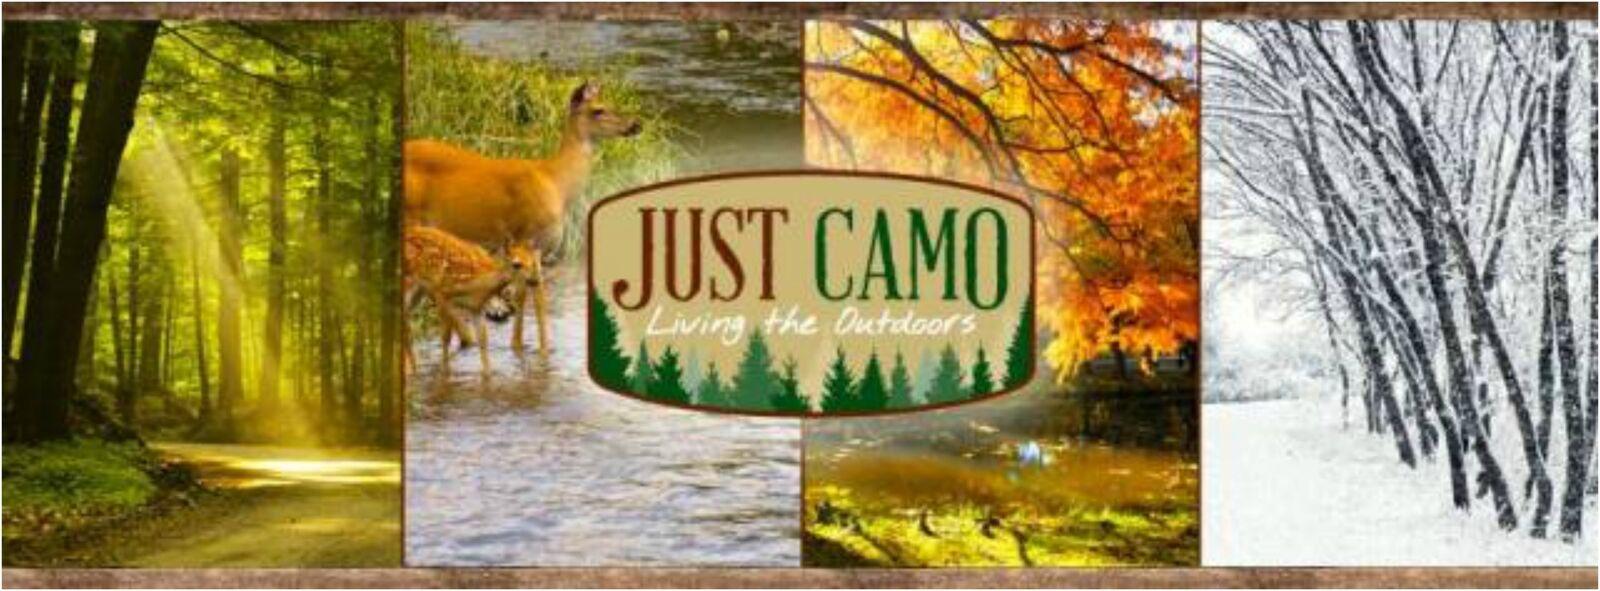 Just Camo USA